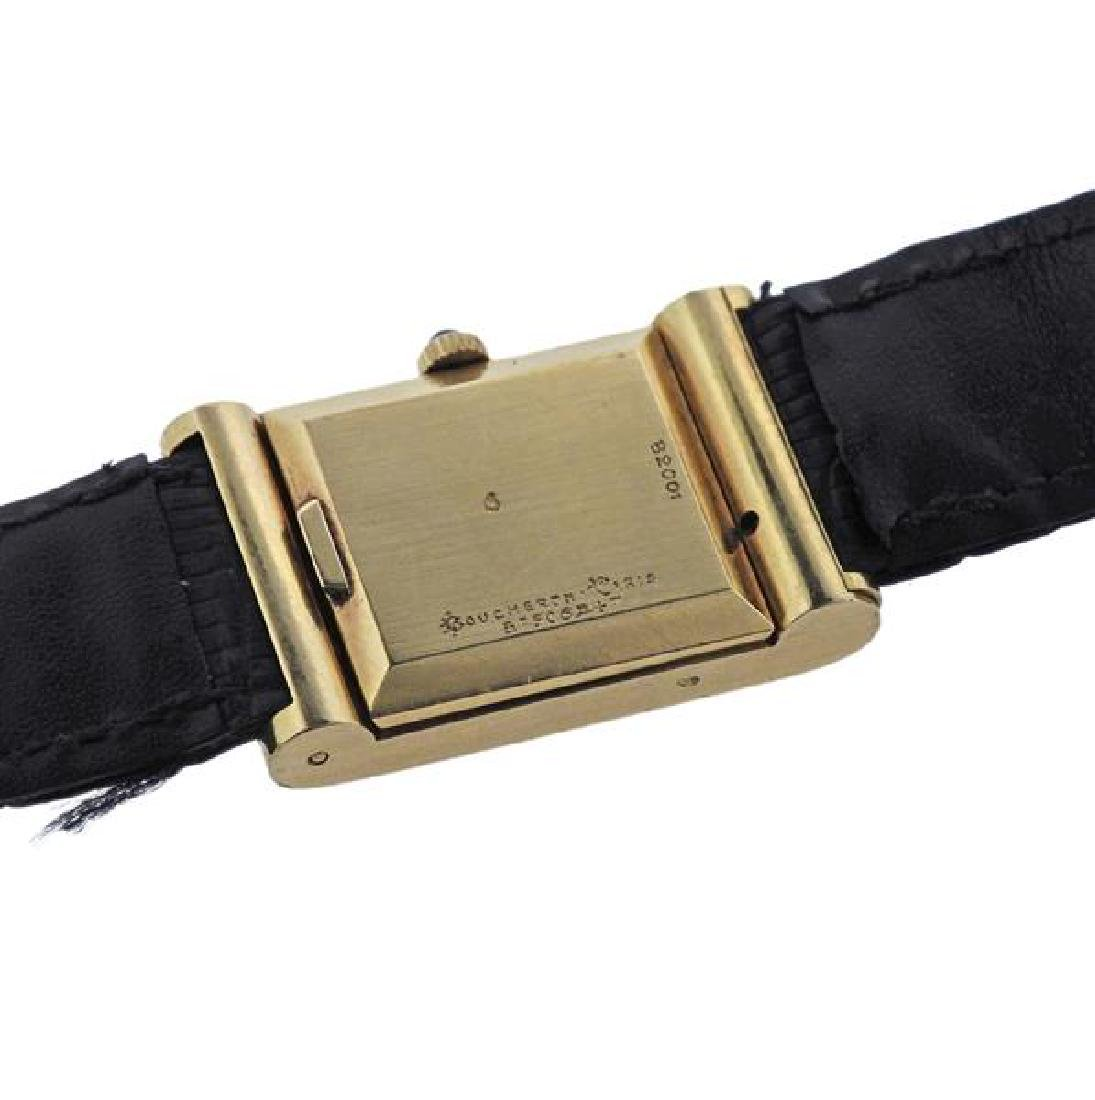 Boucheron 18K Gold Quartz Lady's Watch - 4